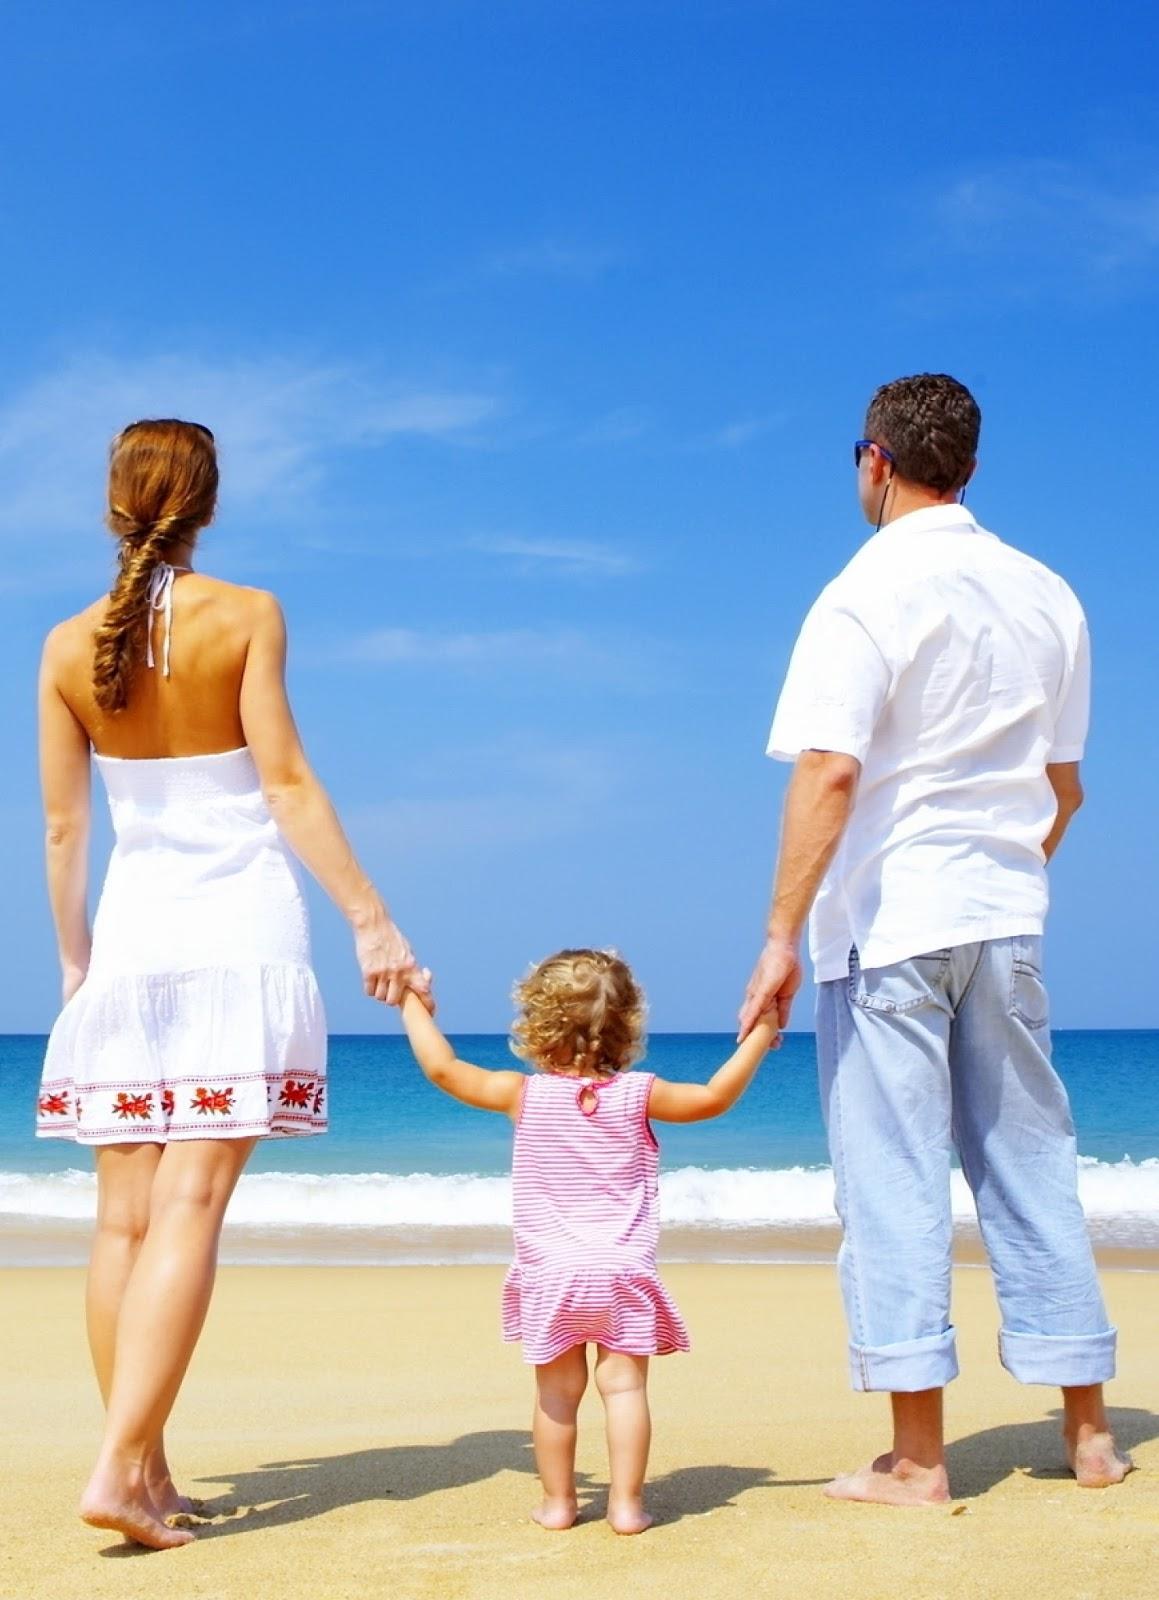 Family, Child, Sand, Beach, Sea, Happiness